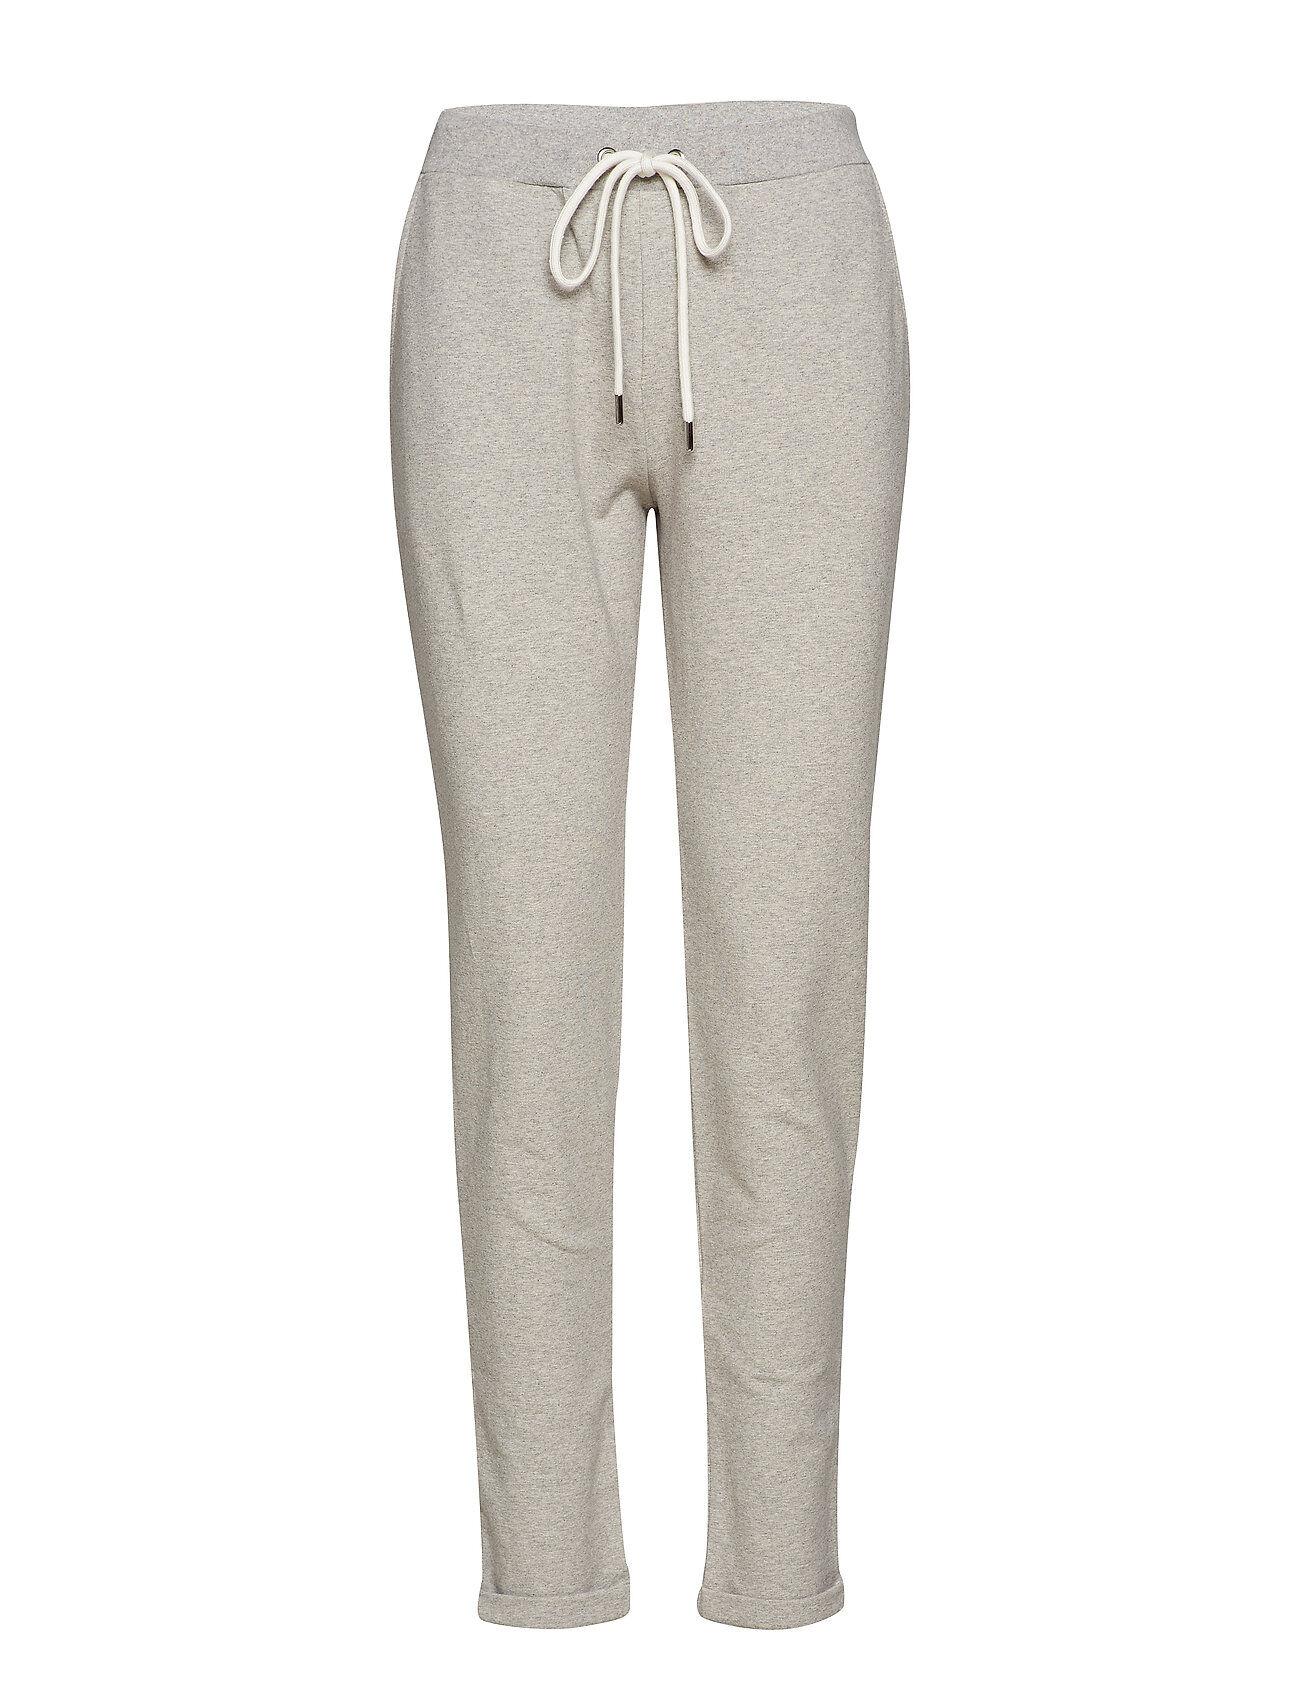 Nanso Ladies Trousers, Trousers